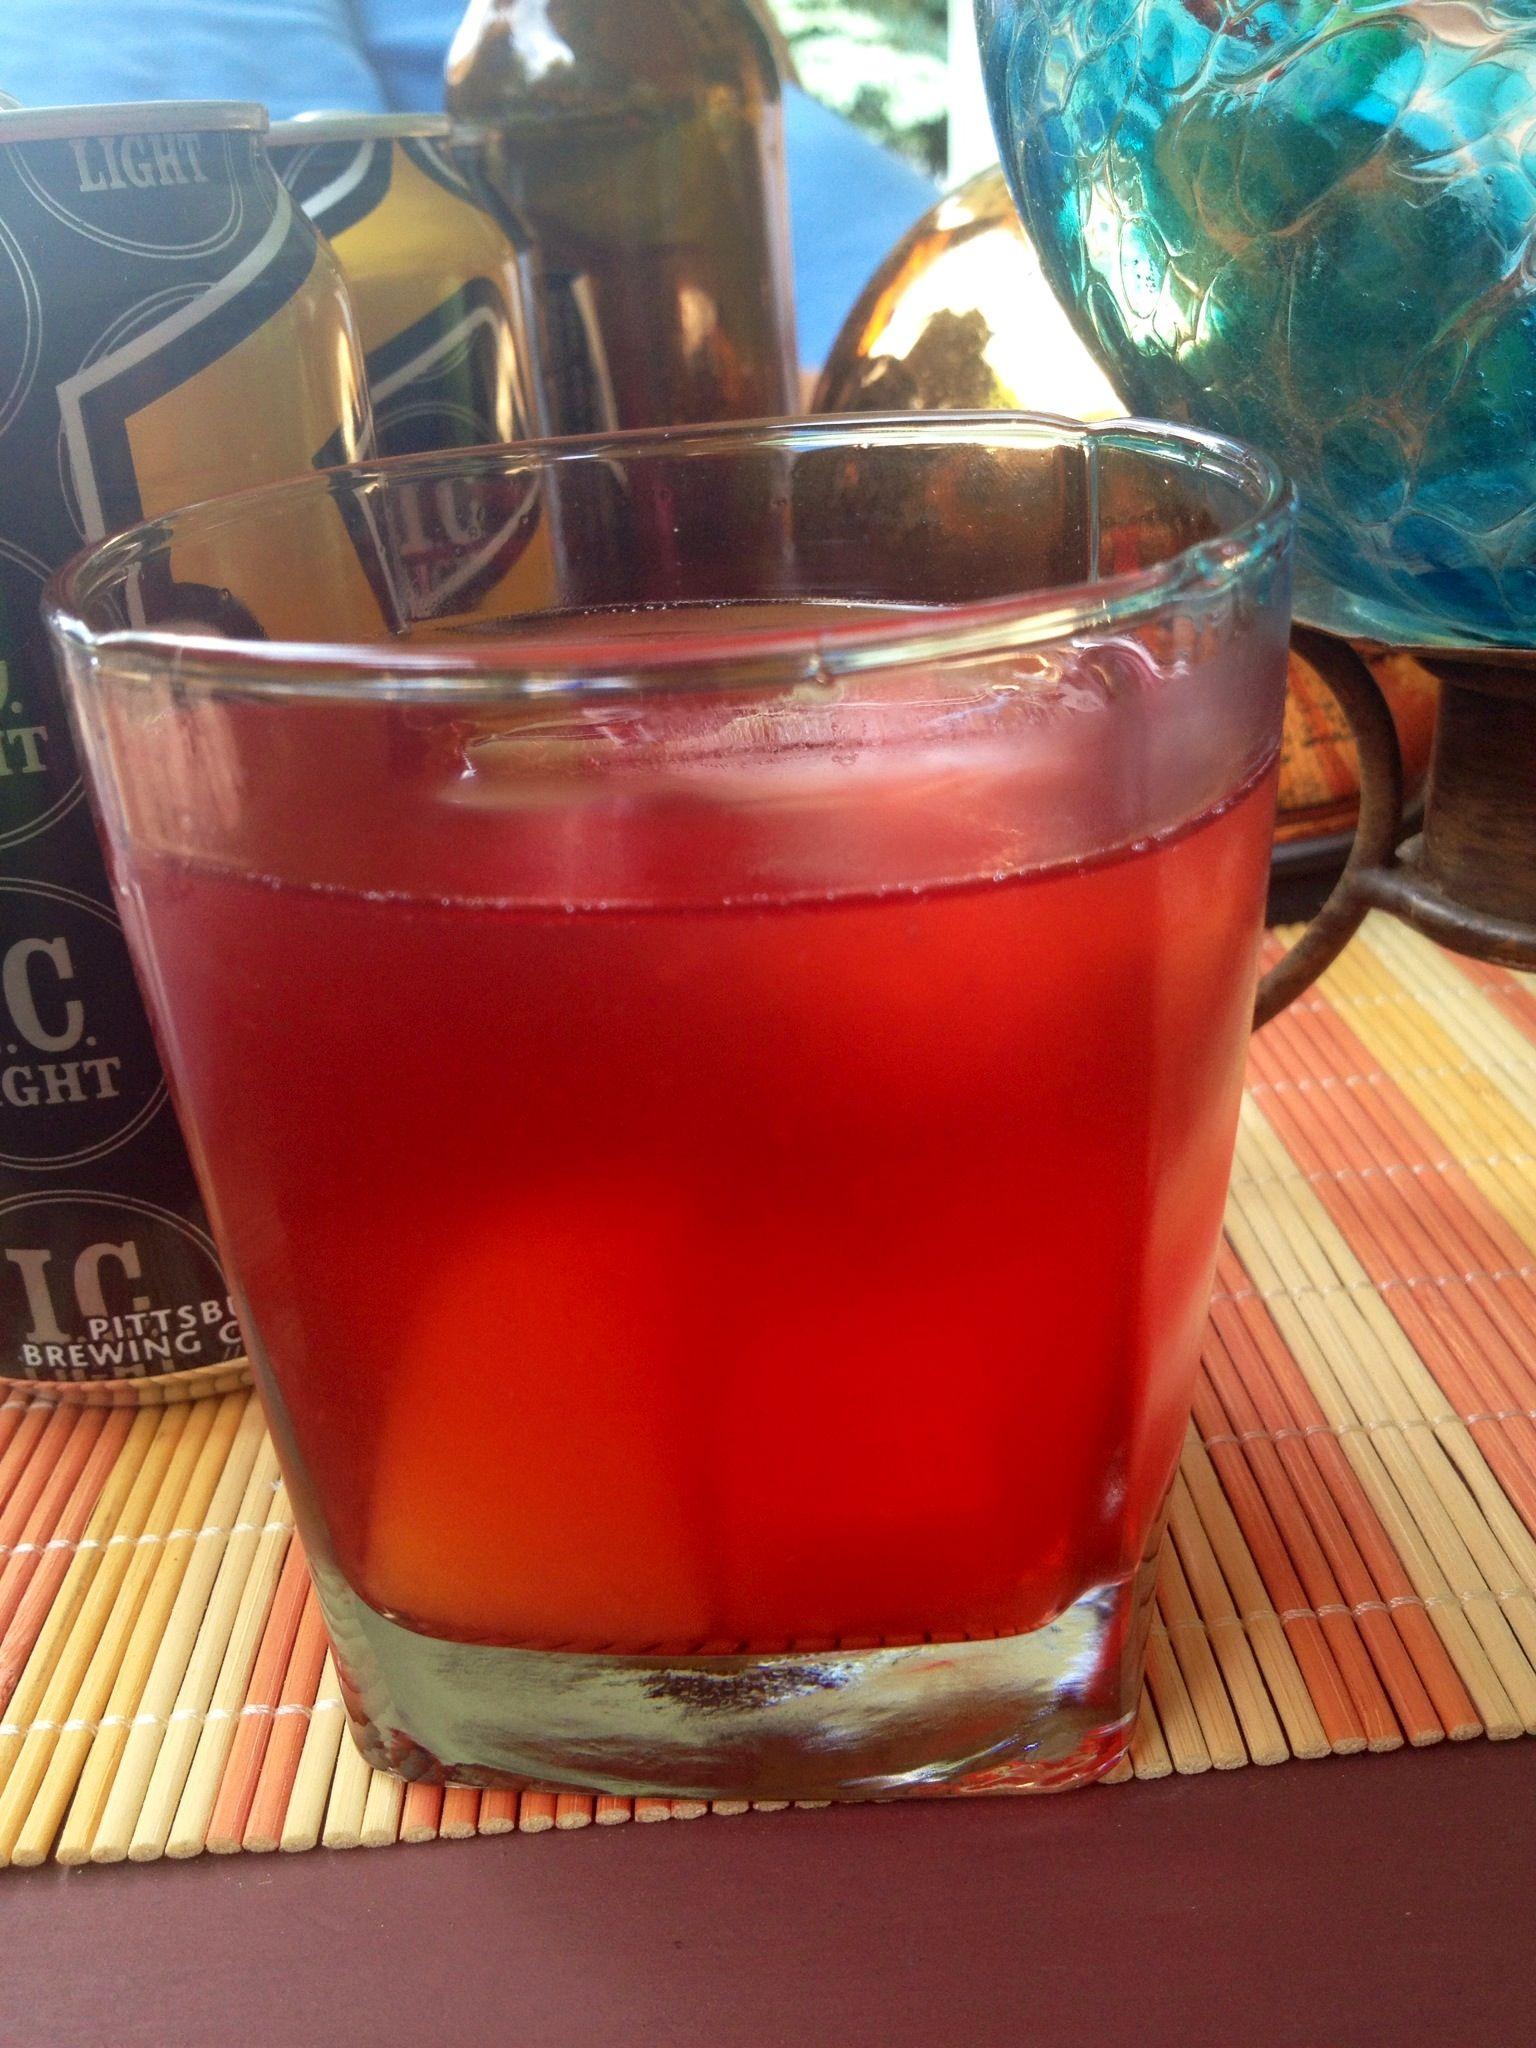 Leish S Summer Sangria 1 Whole Can Dole Tropical Fruits Plus The Juice 3 4 Pitcher Arbor Mist Sangria Splash Of Ora Summer Sangria Wine Drinks Fruit Plus